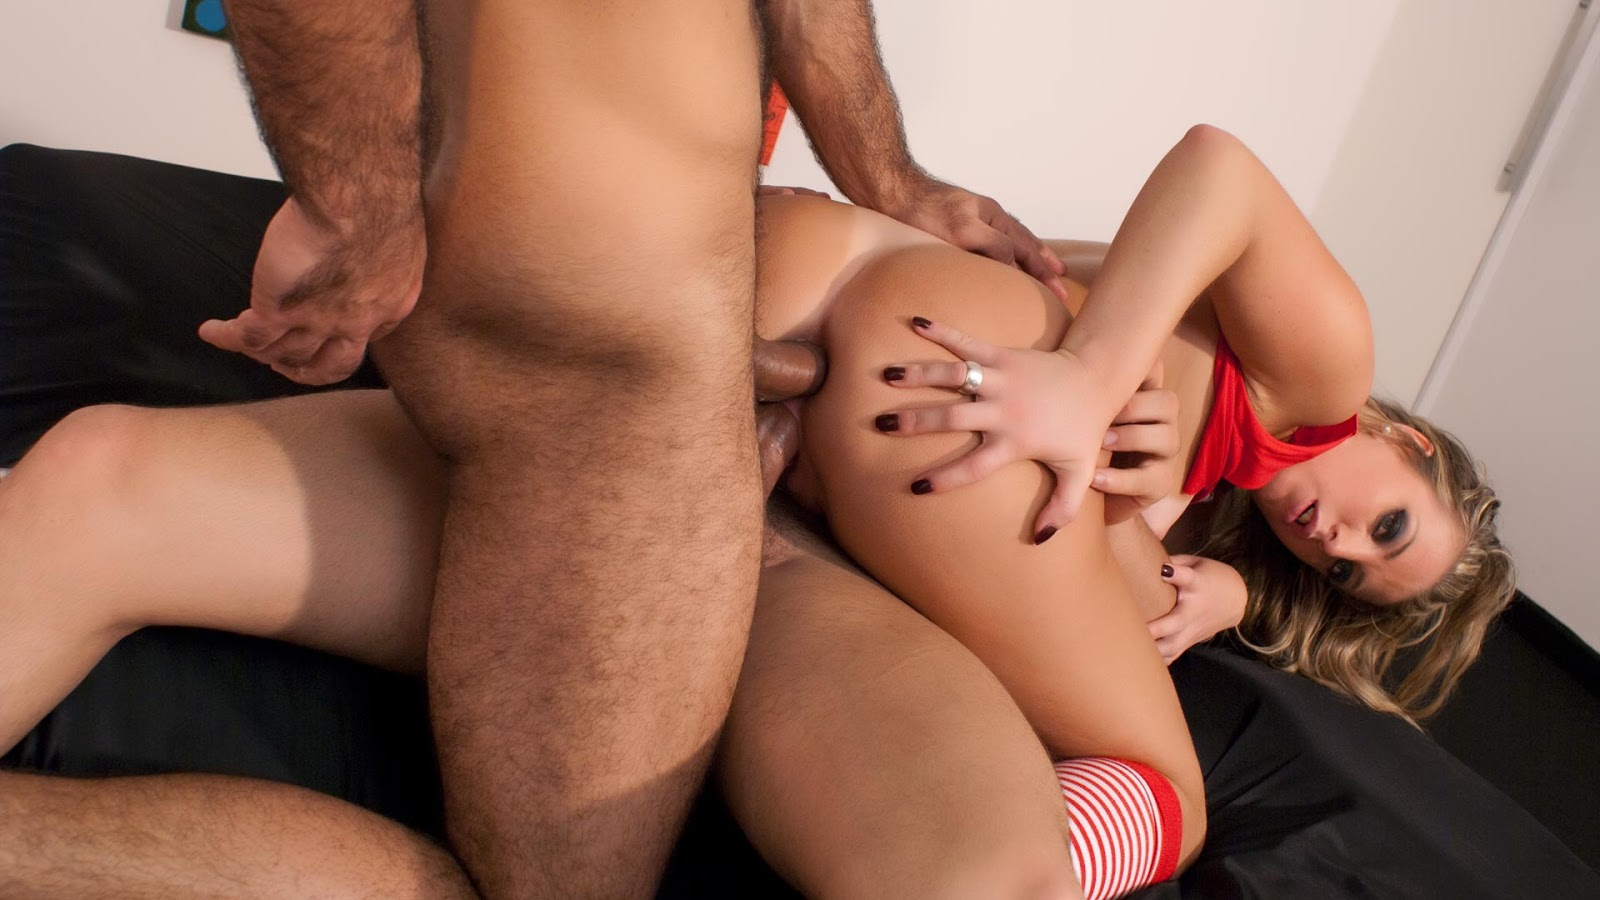 Watch Free Milena Velba And The Maid Porn Pics On Empflix Porn Galery